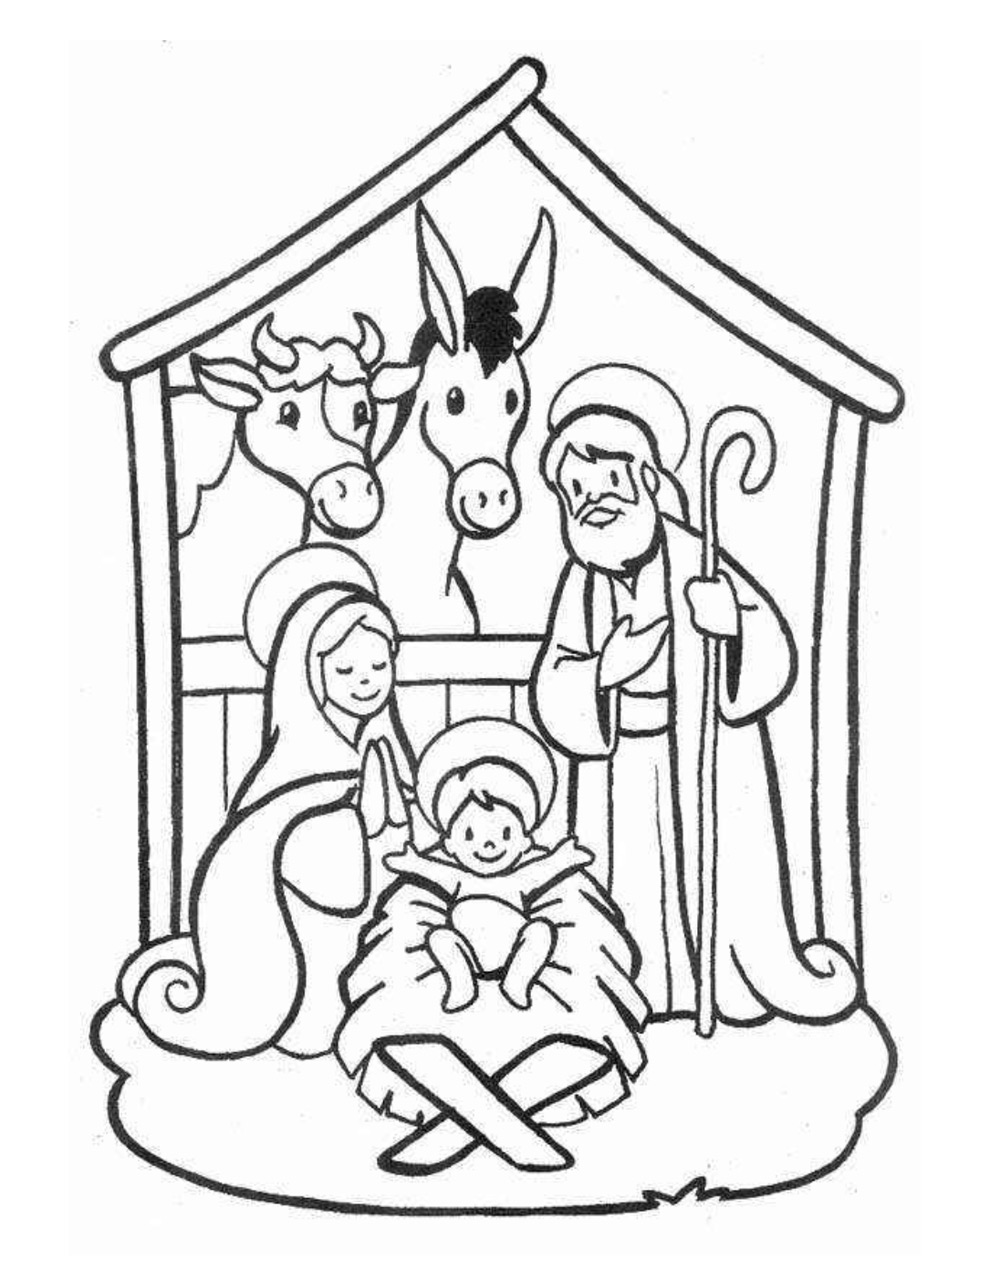 Dibujos navide os para colorear e imprimir gratis - Dibujos infantiles originales ...